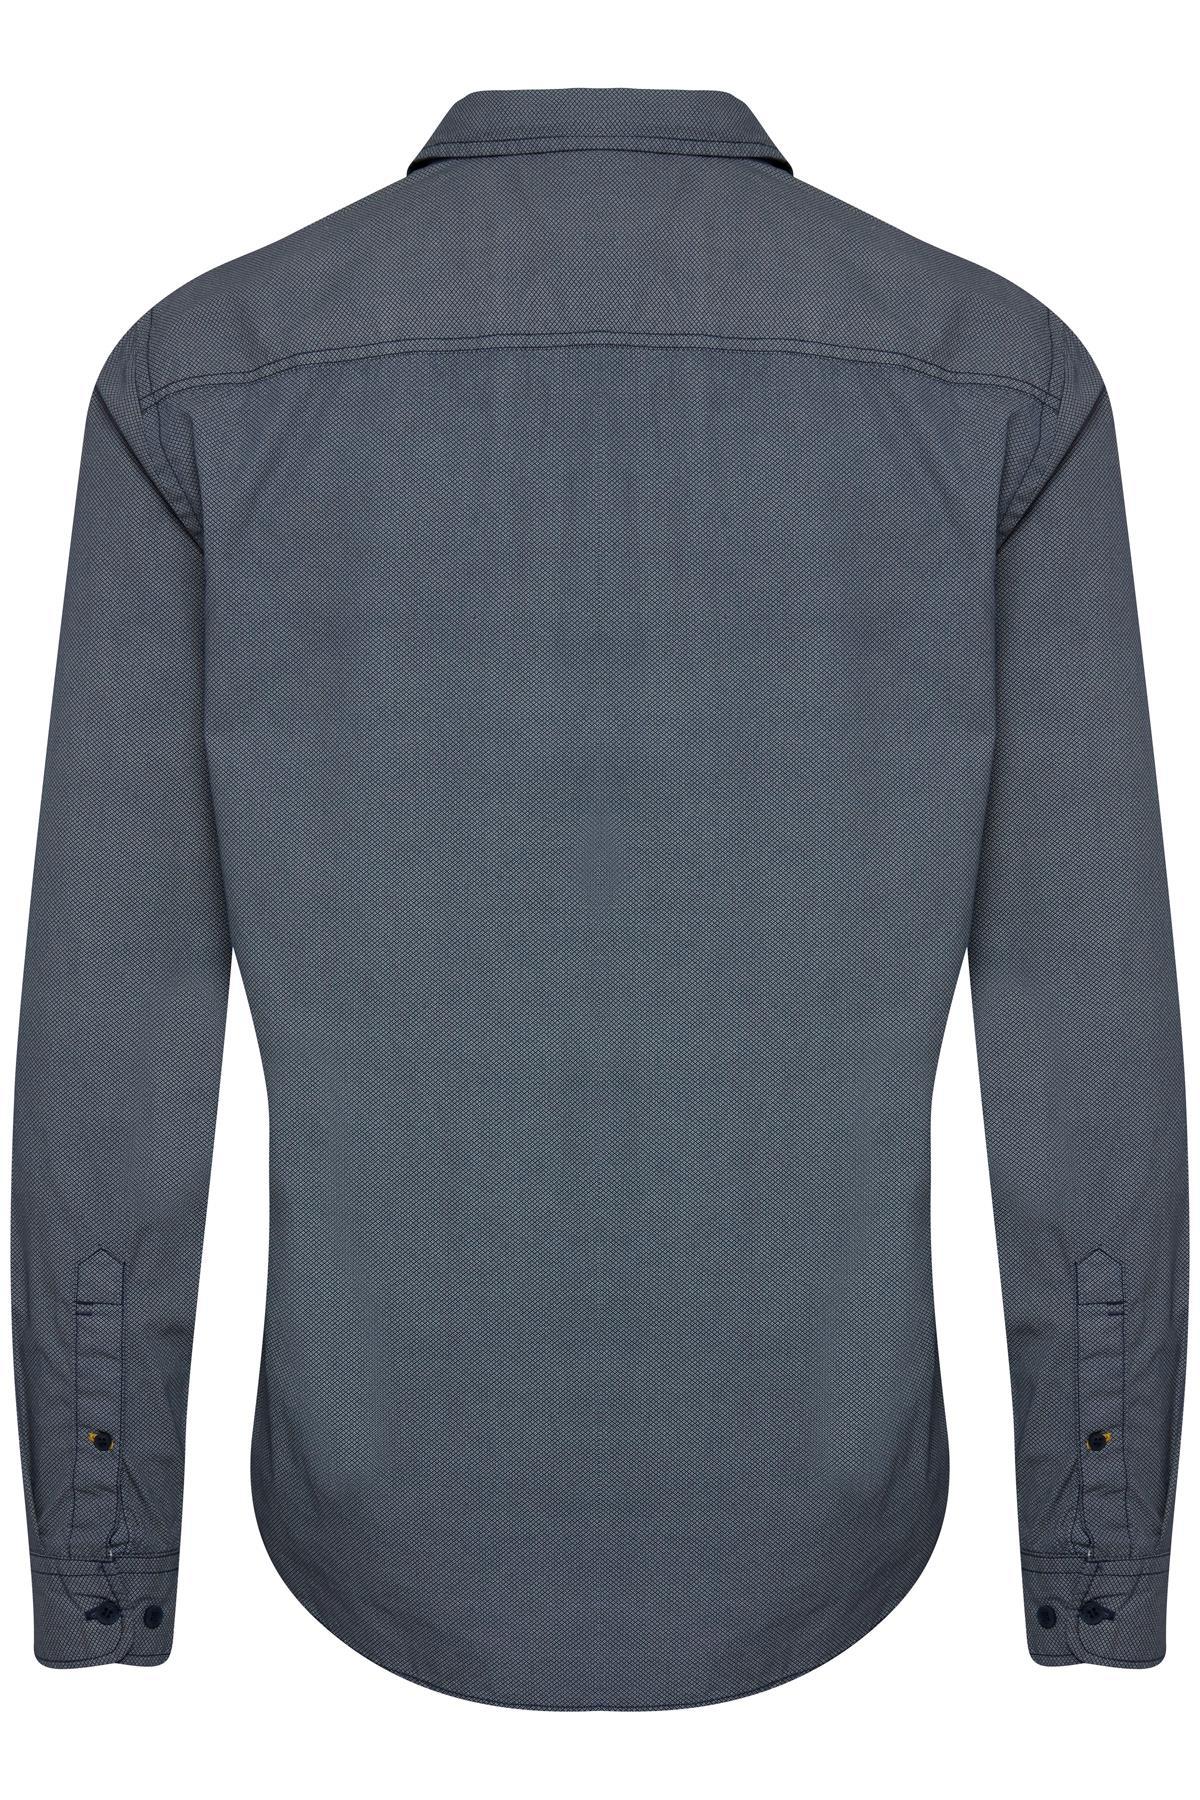 Mood Indigo Blue Long sleeved shirt fra Blend He – Køb Mood Indigo Blue Long sleeved shirt fra str. S-XXL her